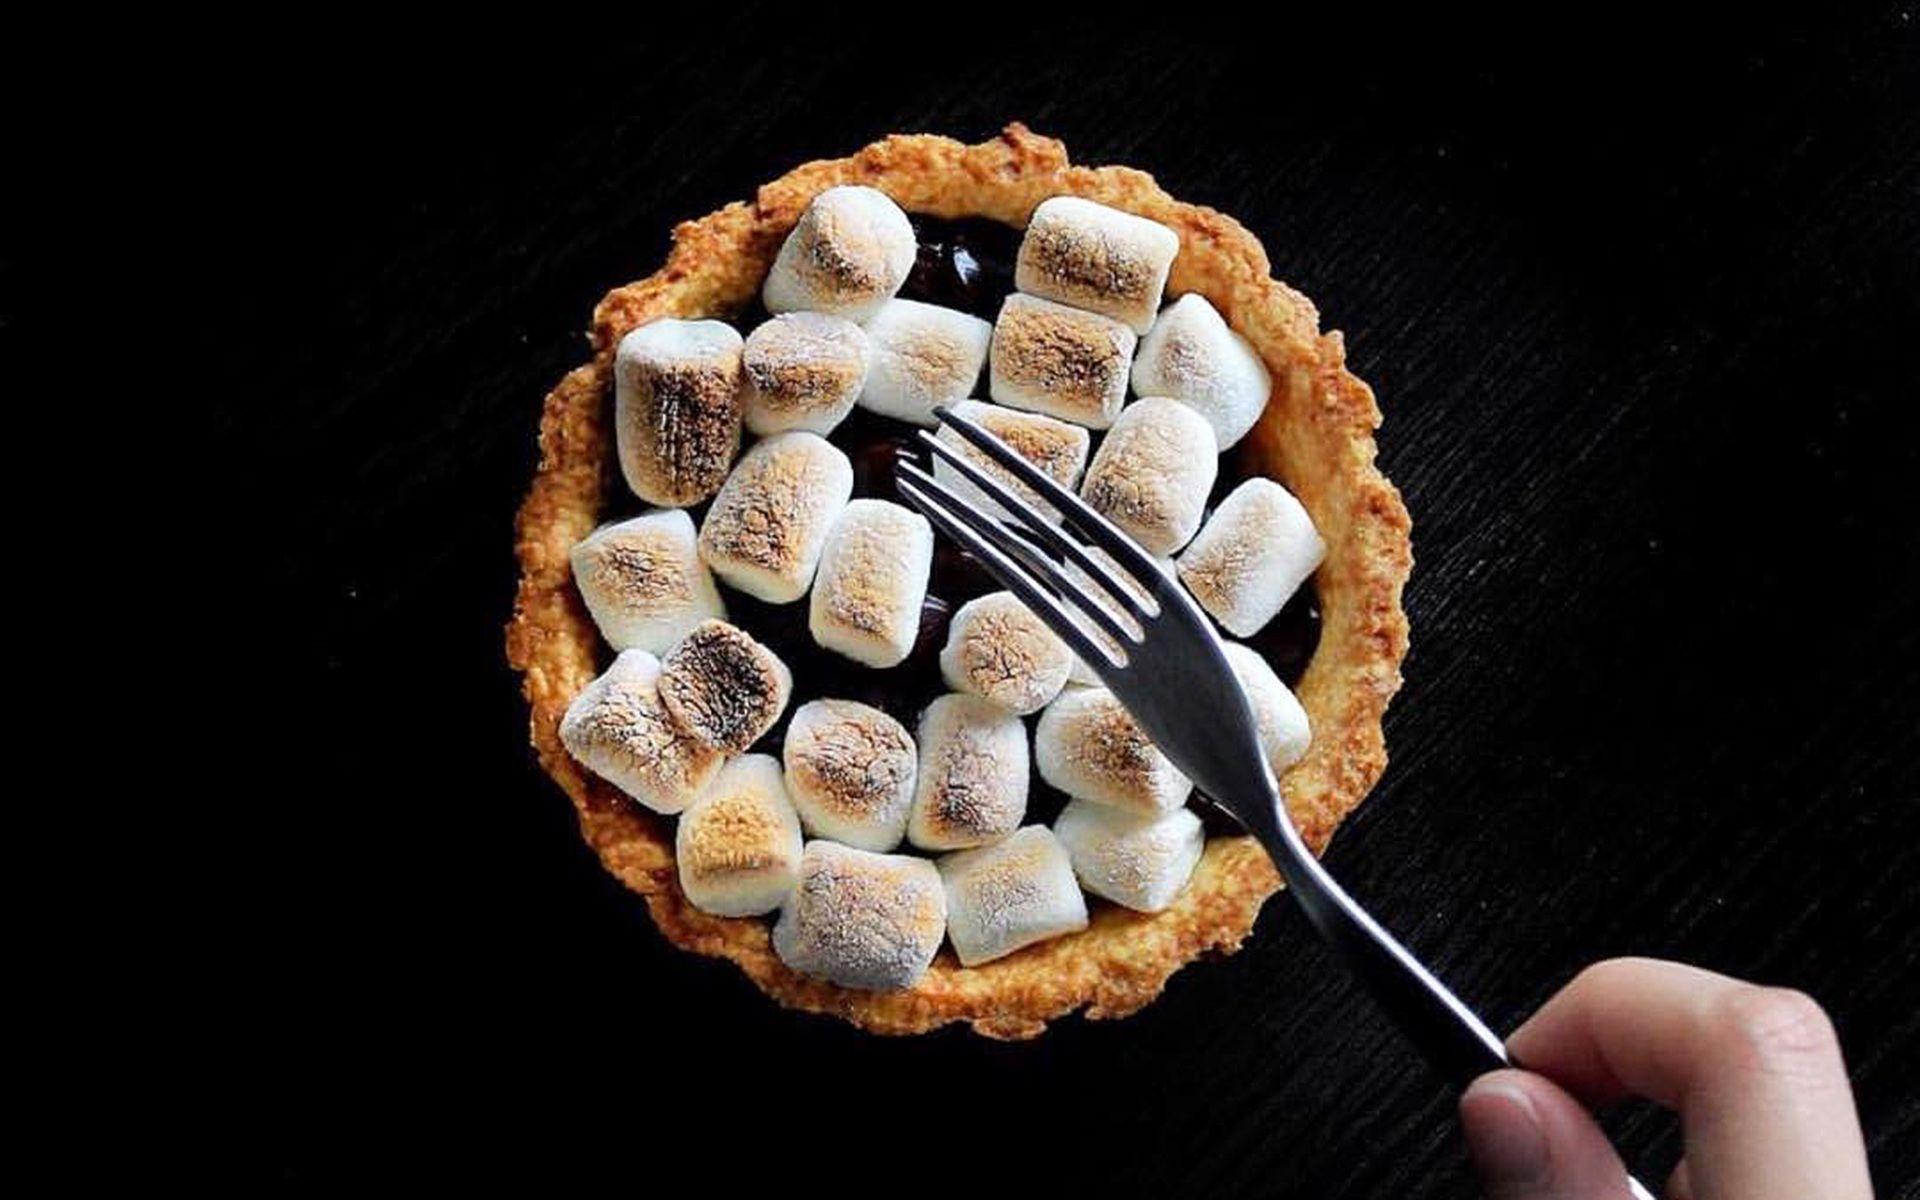 5 Pie Specialists In The Klang Valley